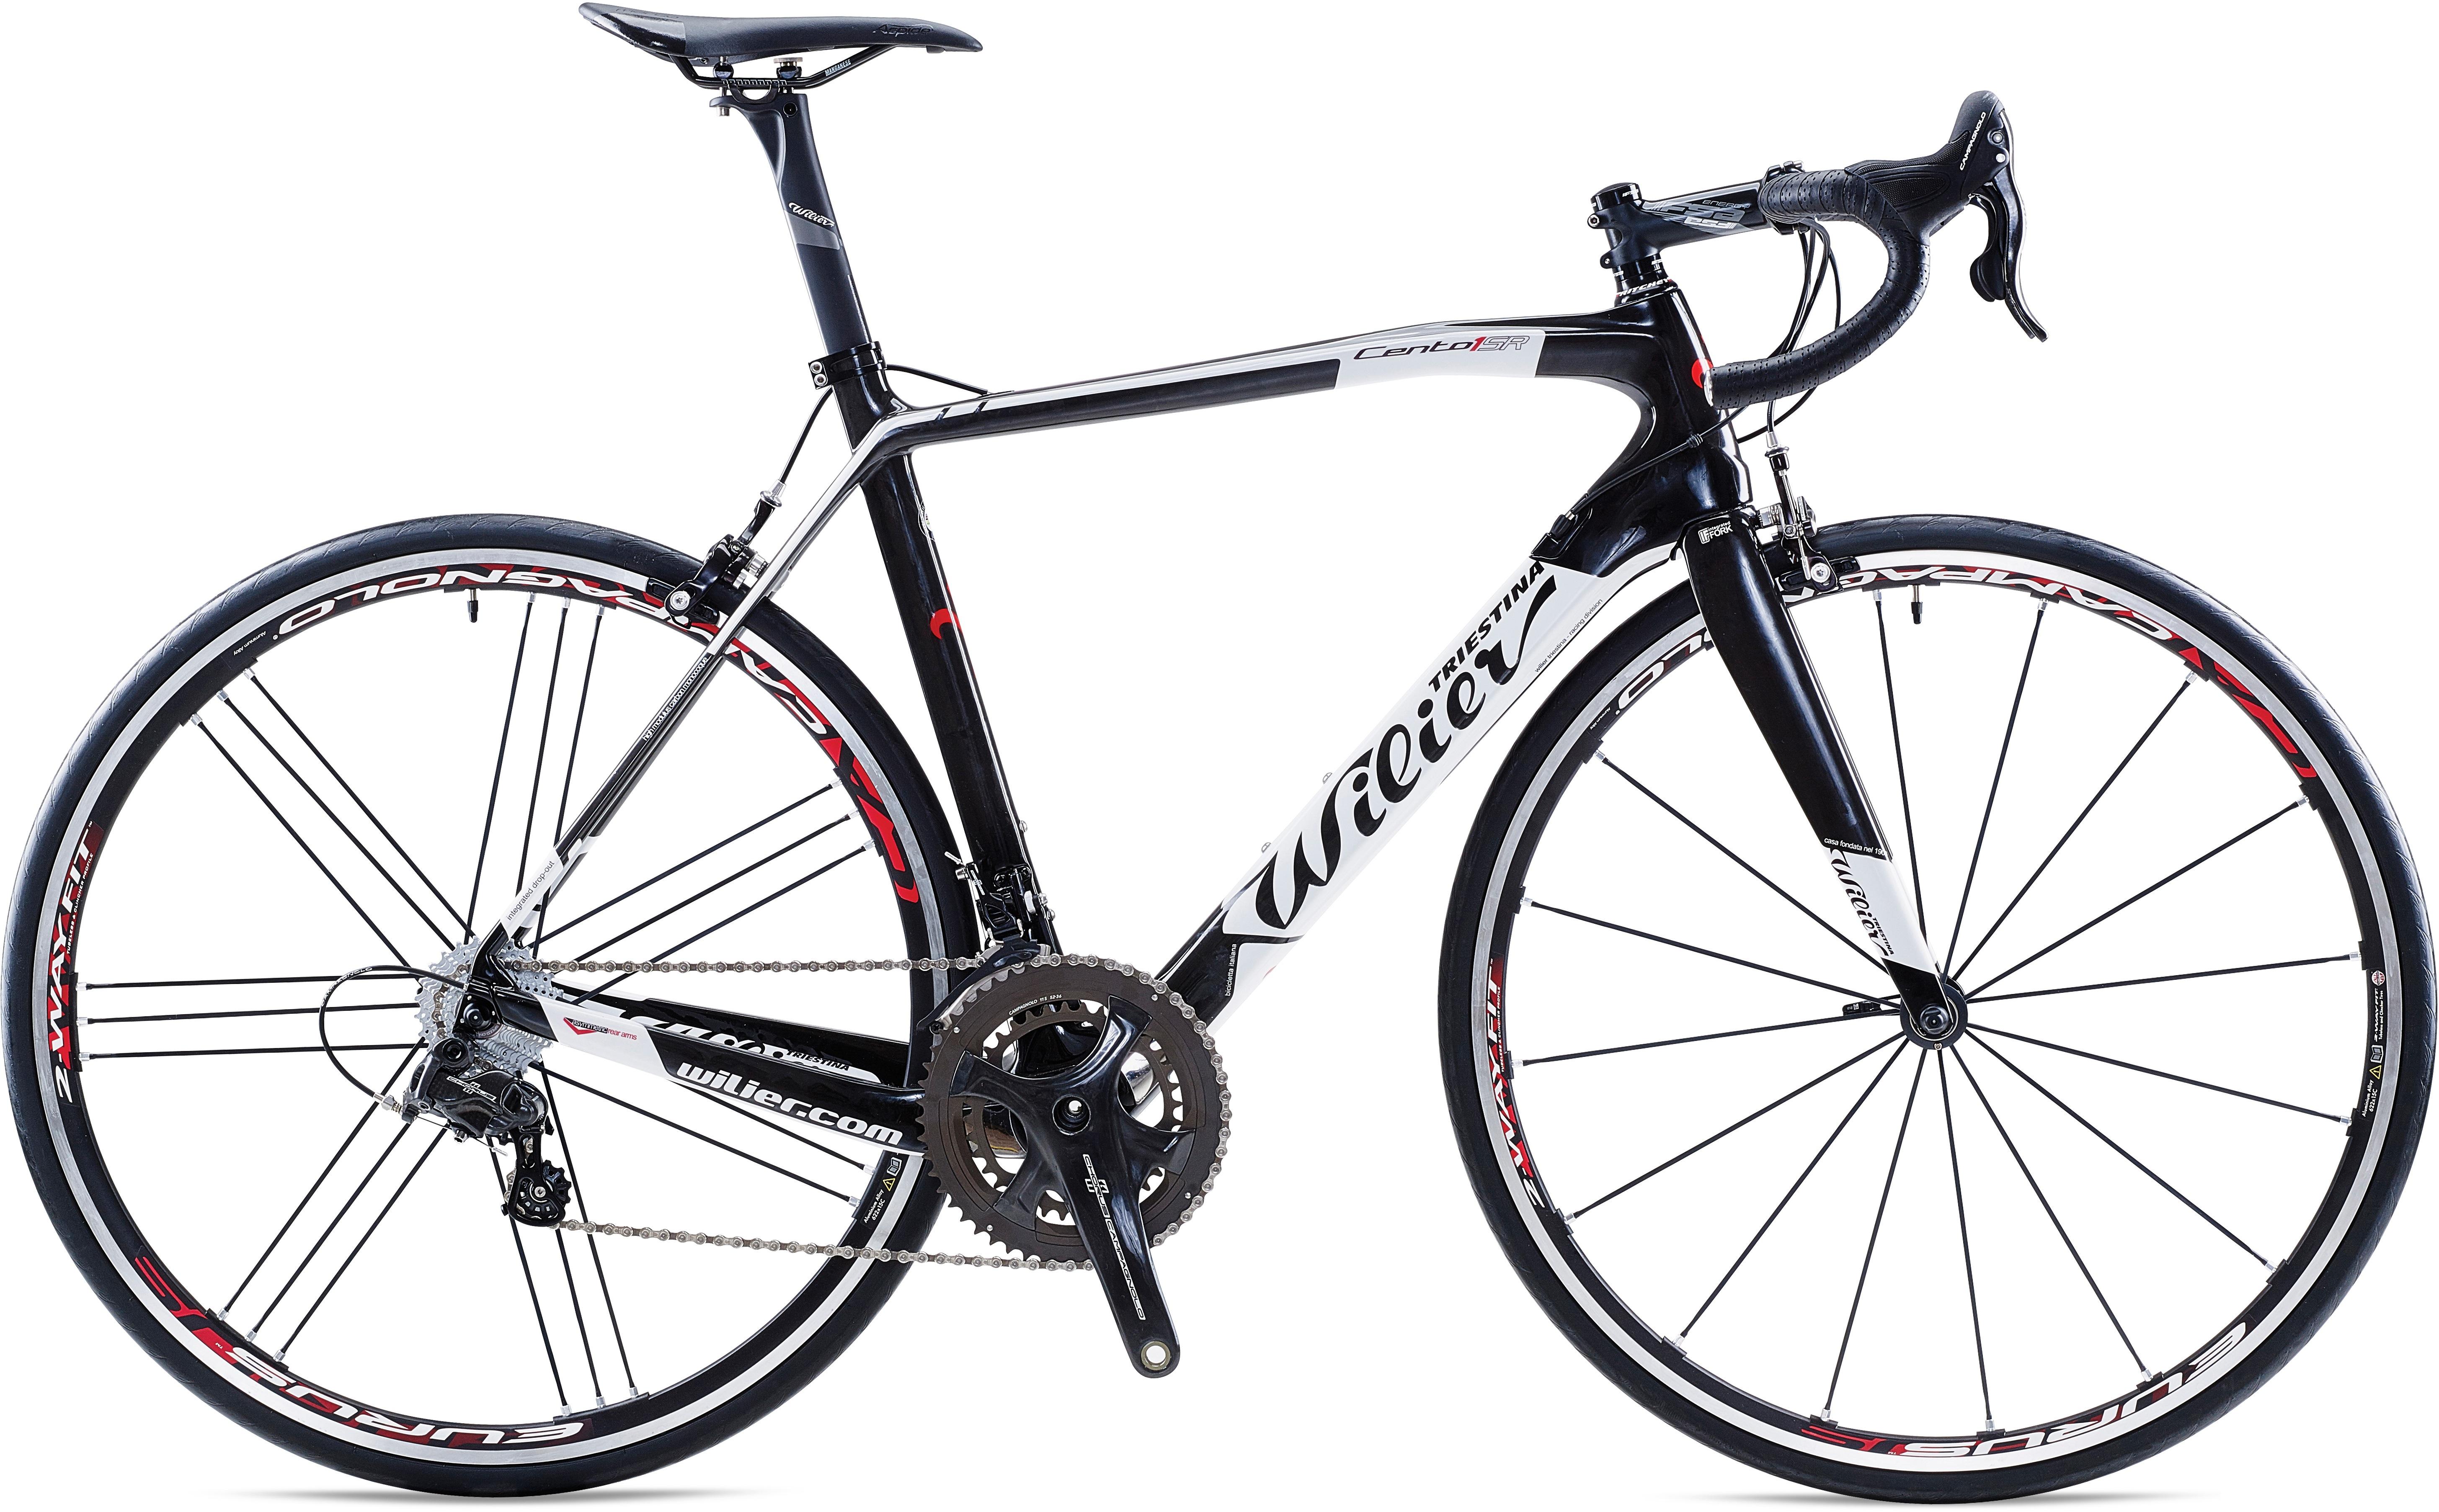 2016 wilier cento 1 sr chorus 171 shop 171 the bike company